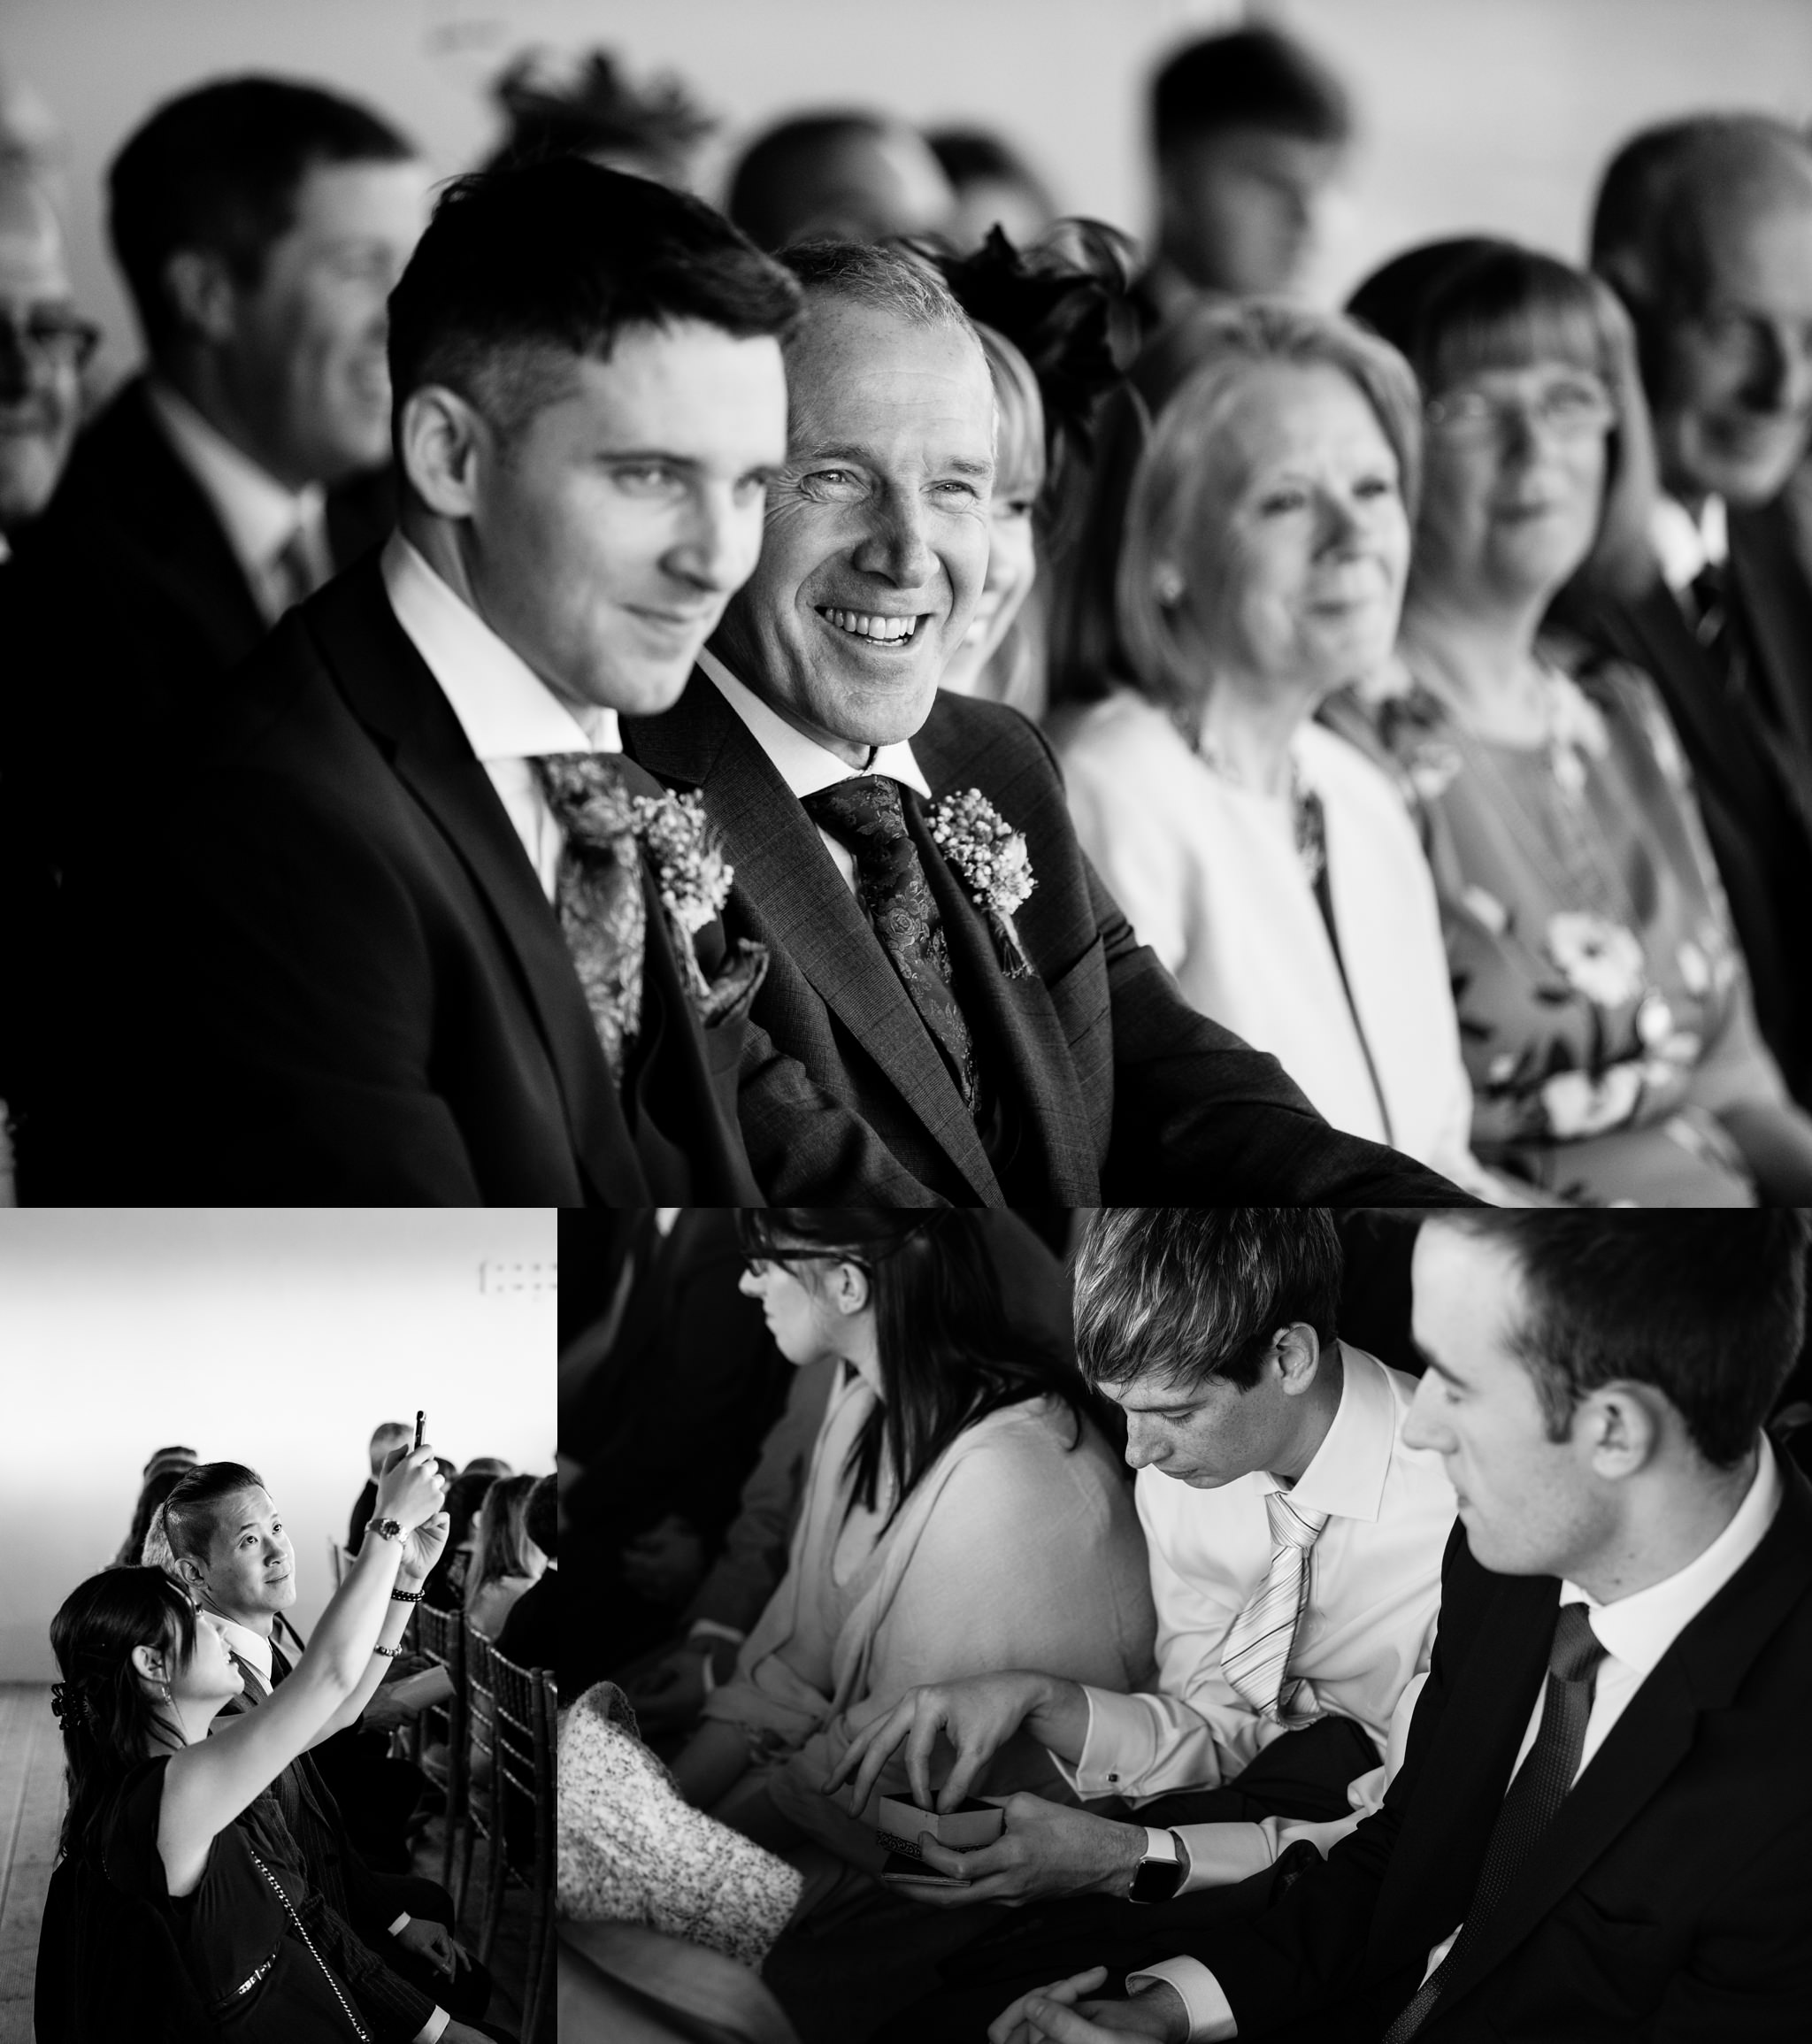 Elisha-Clarke-Photography-Dublin-City-Wedding_0069.jpg